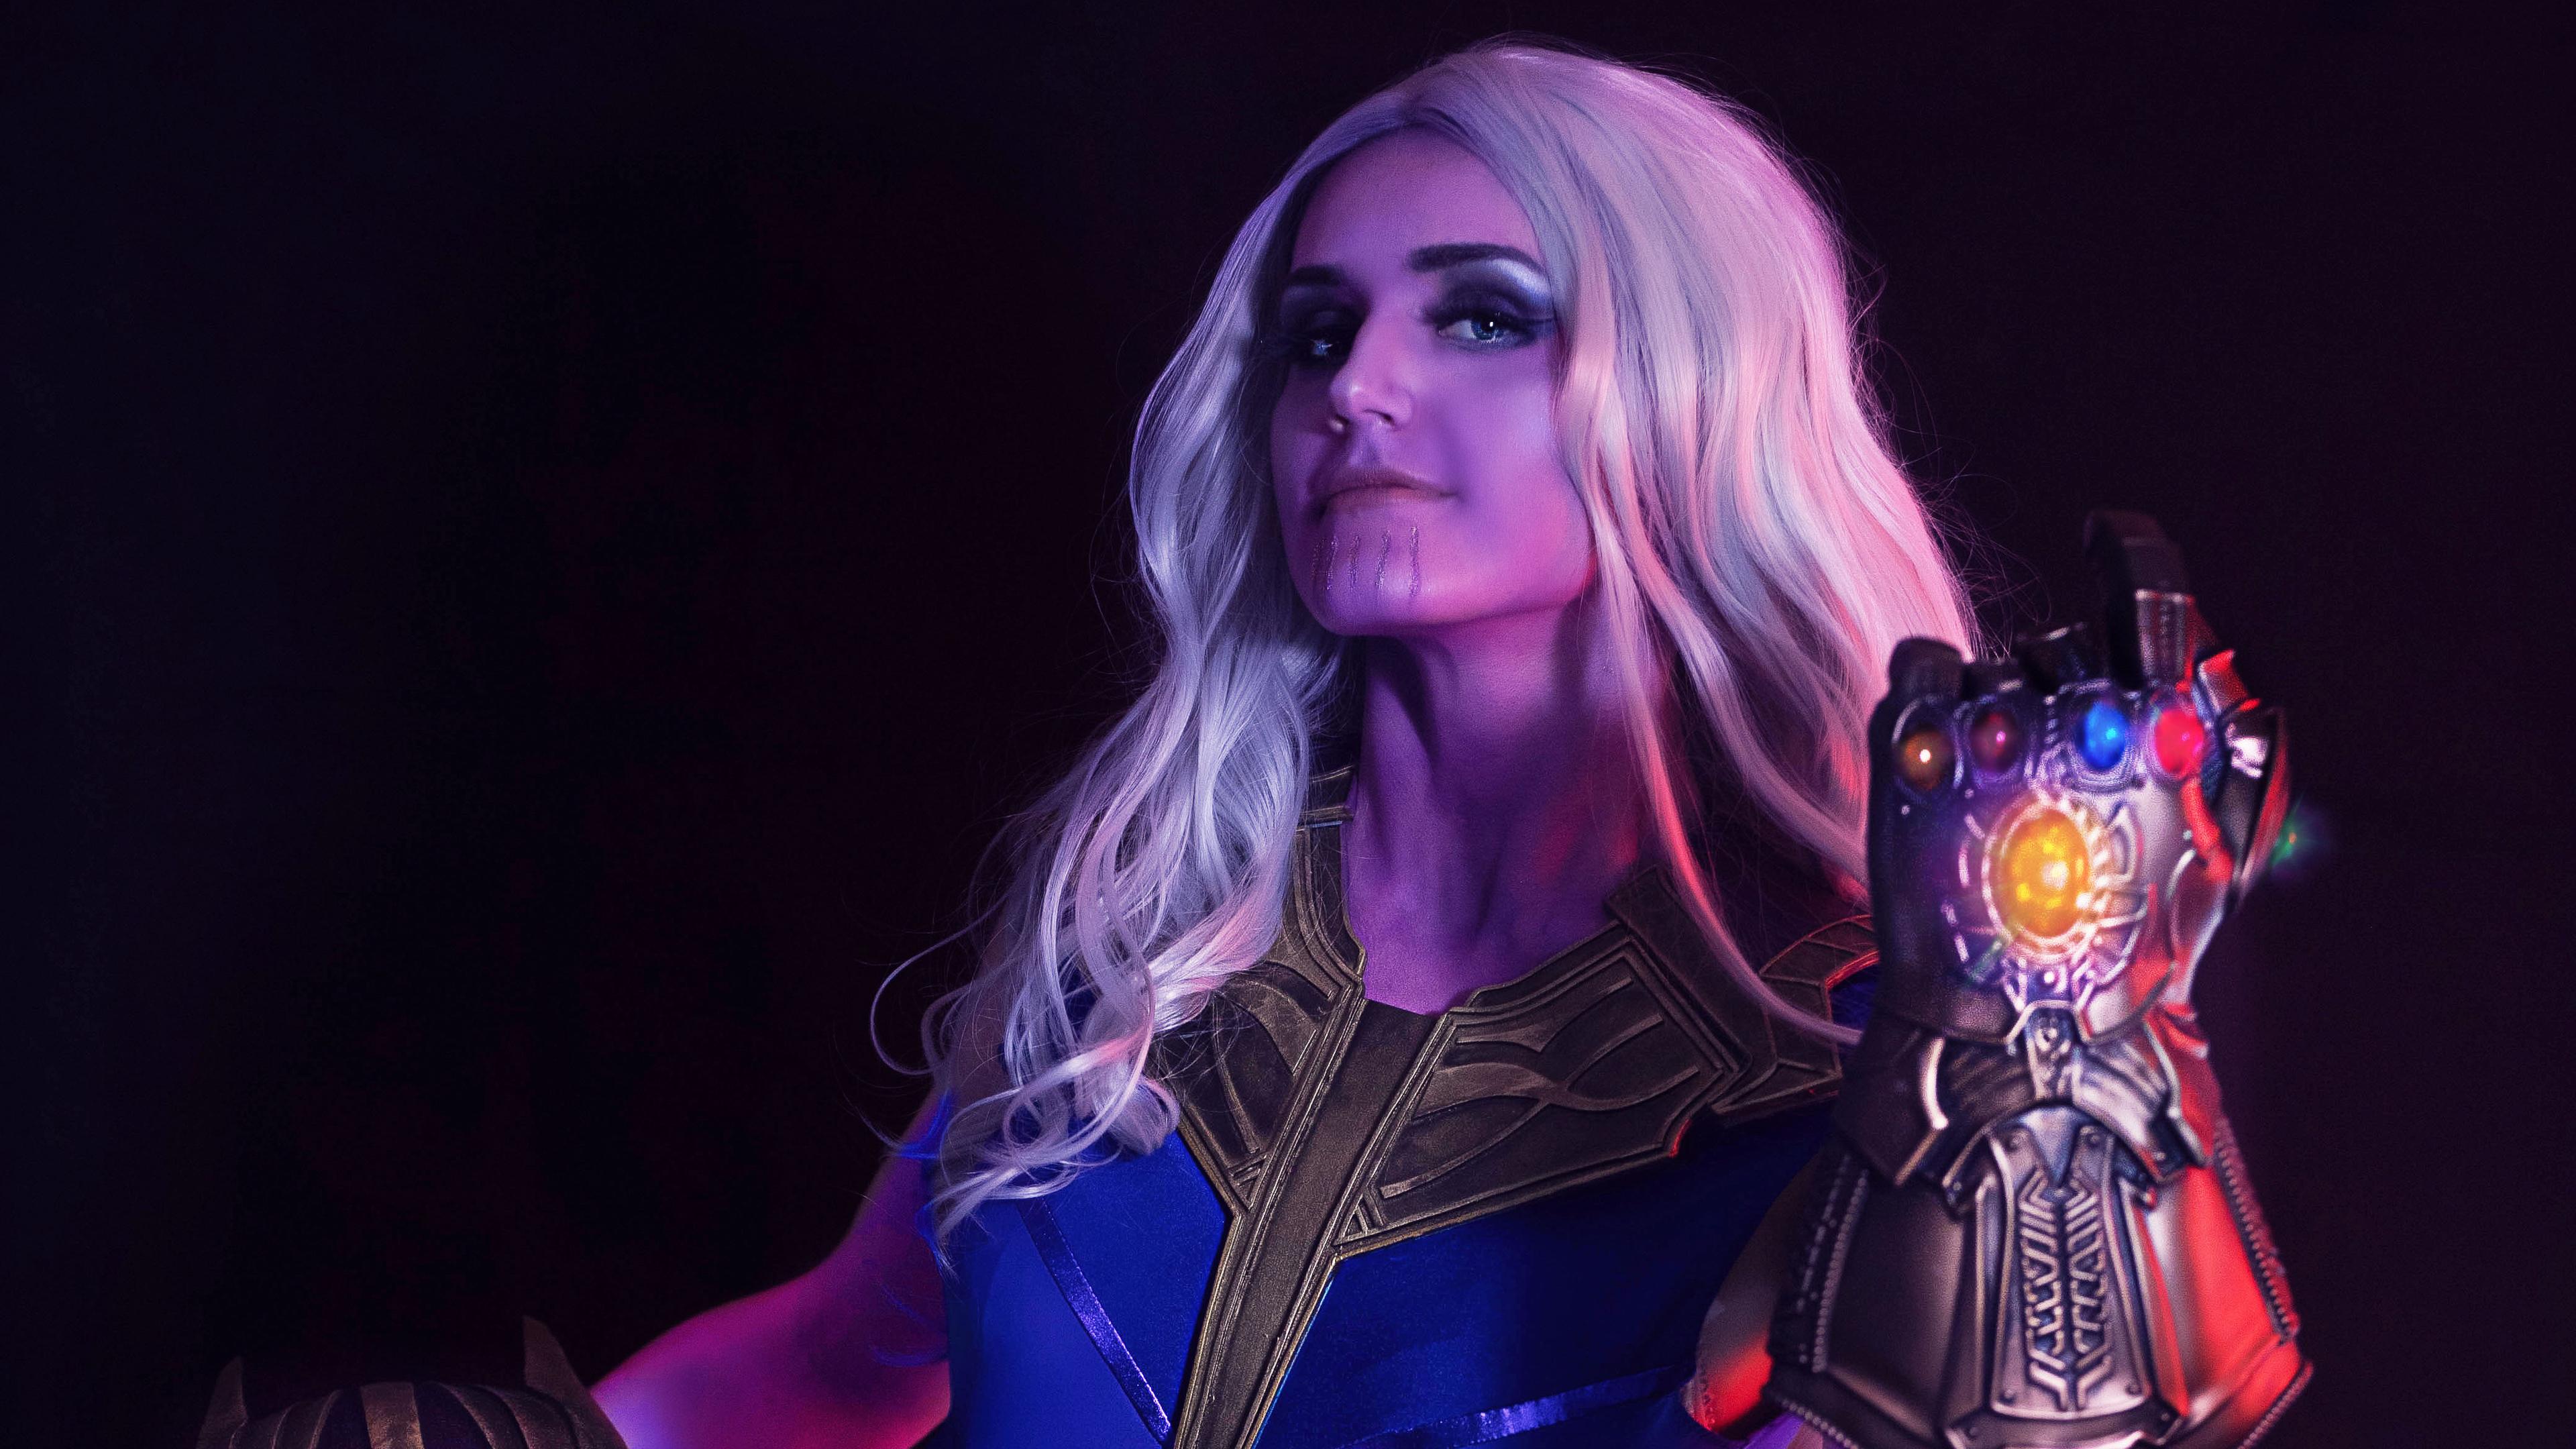 lady thanos 4k 1556184966 - Lady Thanos 4k - thanos-wallpapers, superheroes wallpapers, hd-wallpapers, 4k-wallpapers